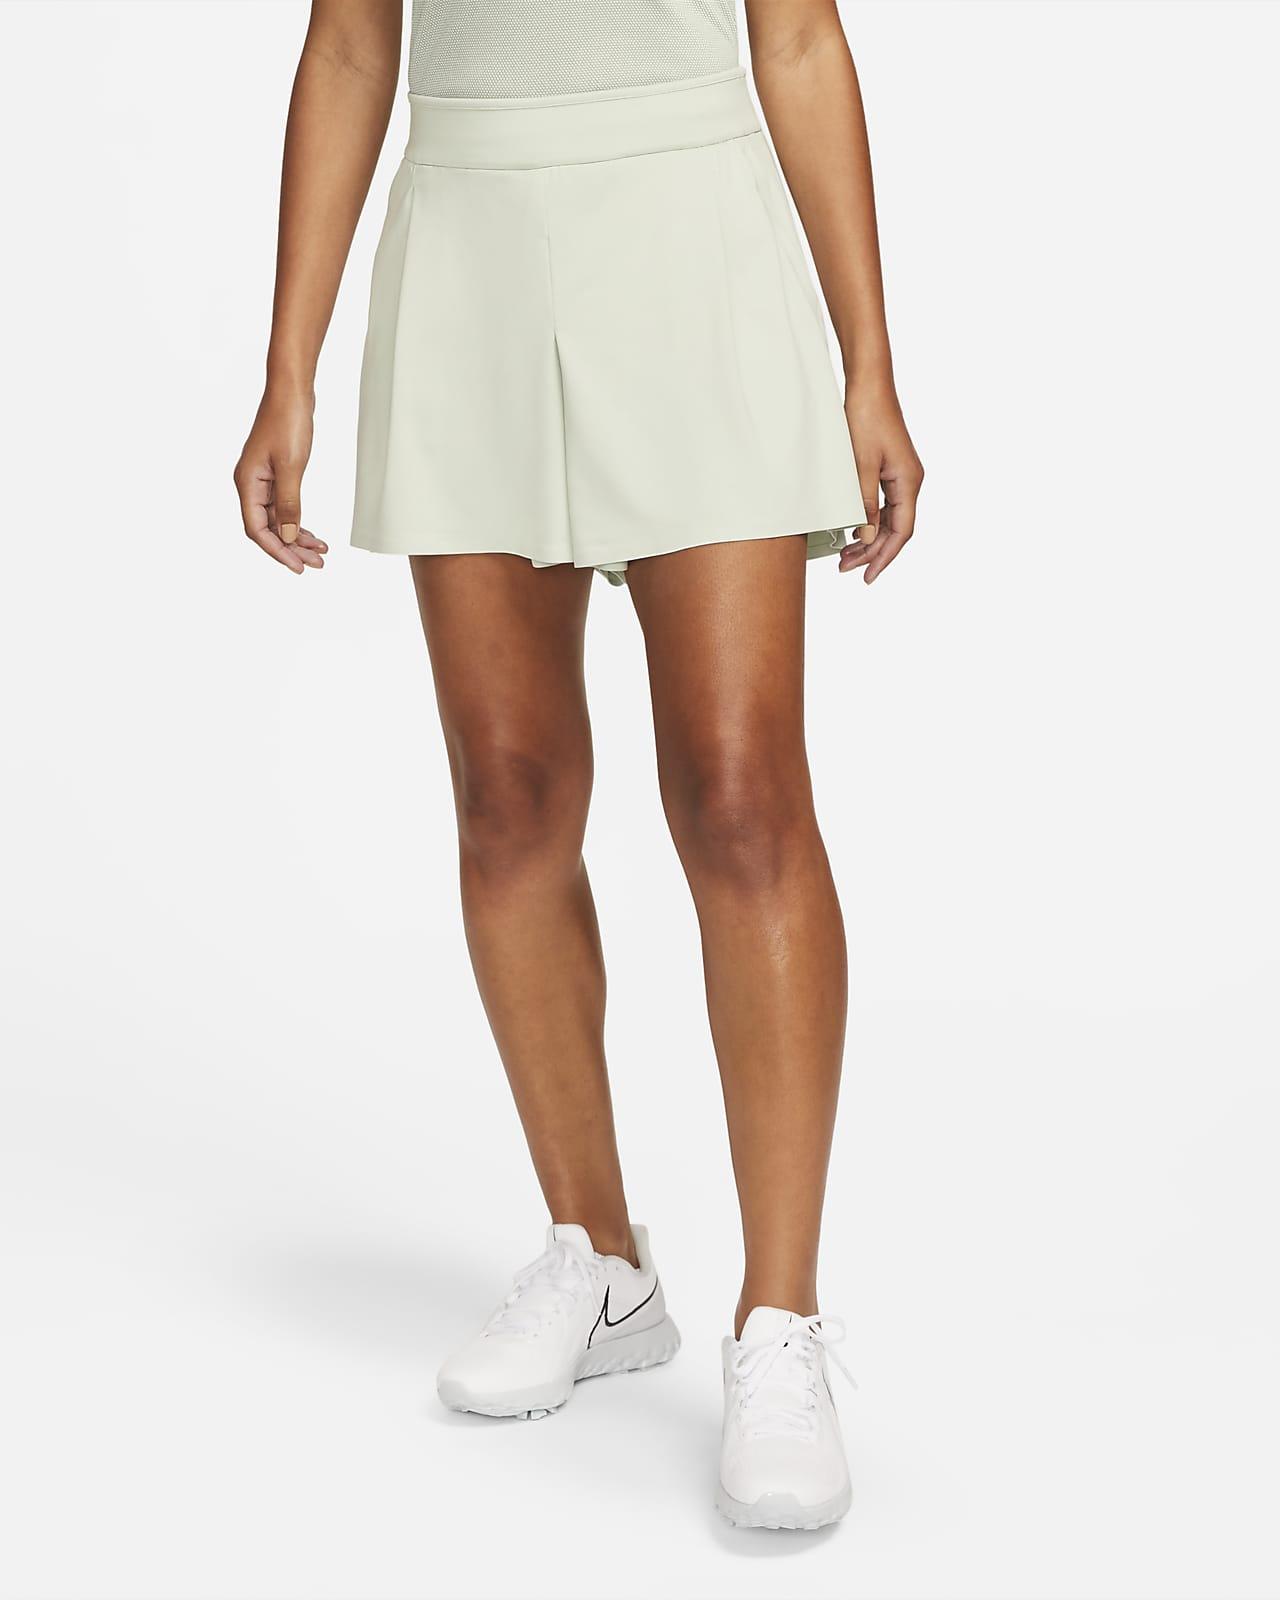 Nike Dri-FIT UV Ace Women's Golf Shorts